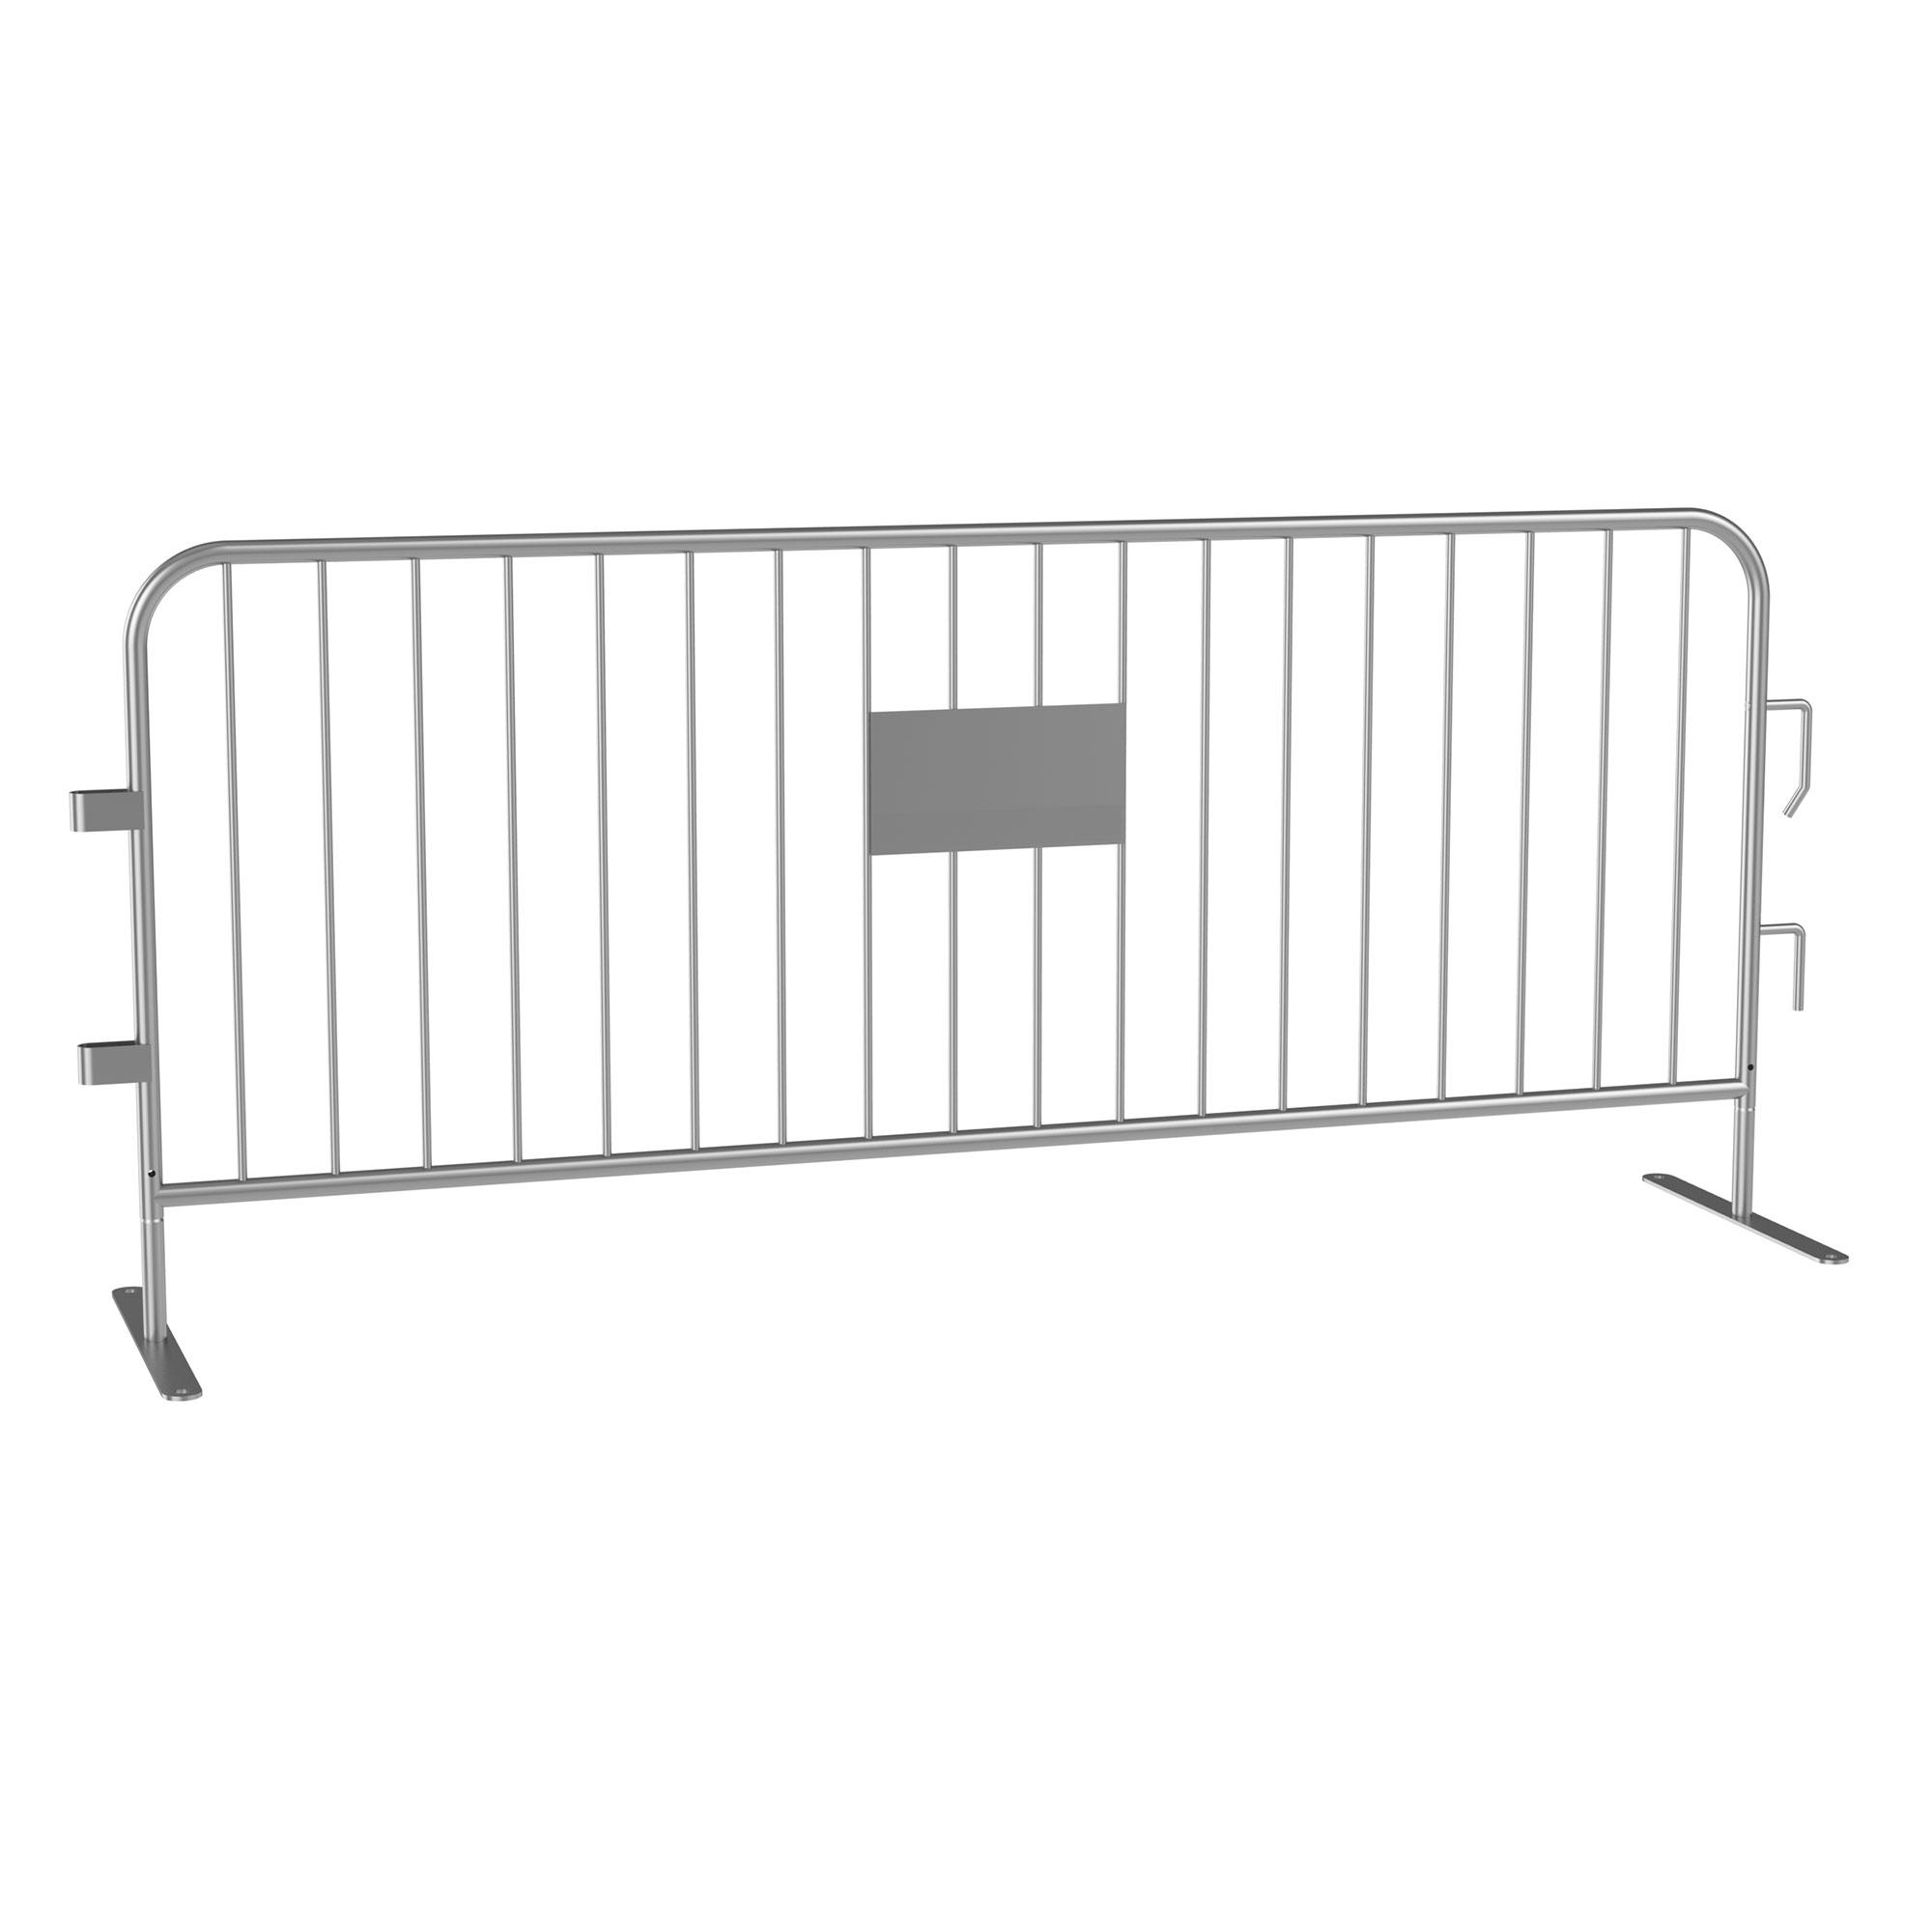 8' Long Galvanized Steel Barricade Bike Rack